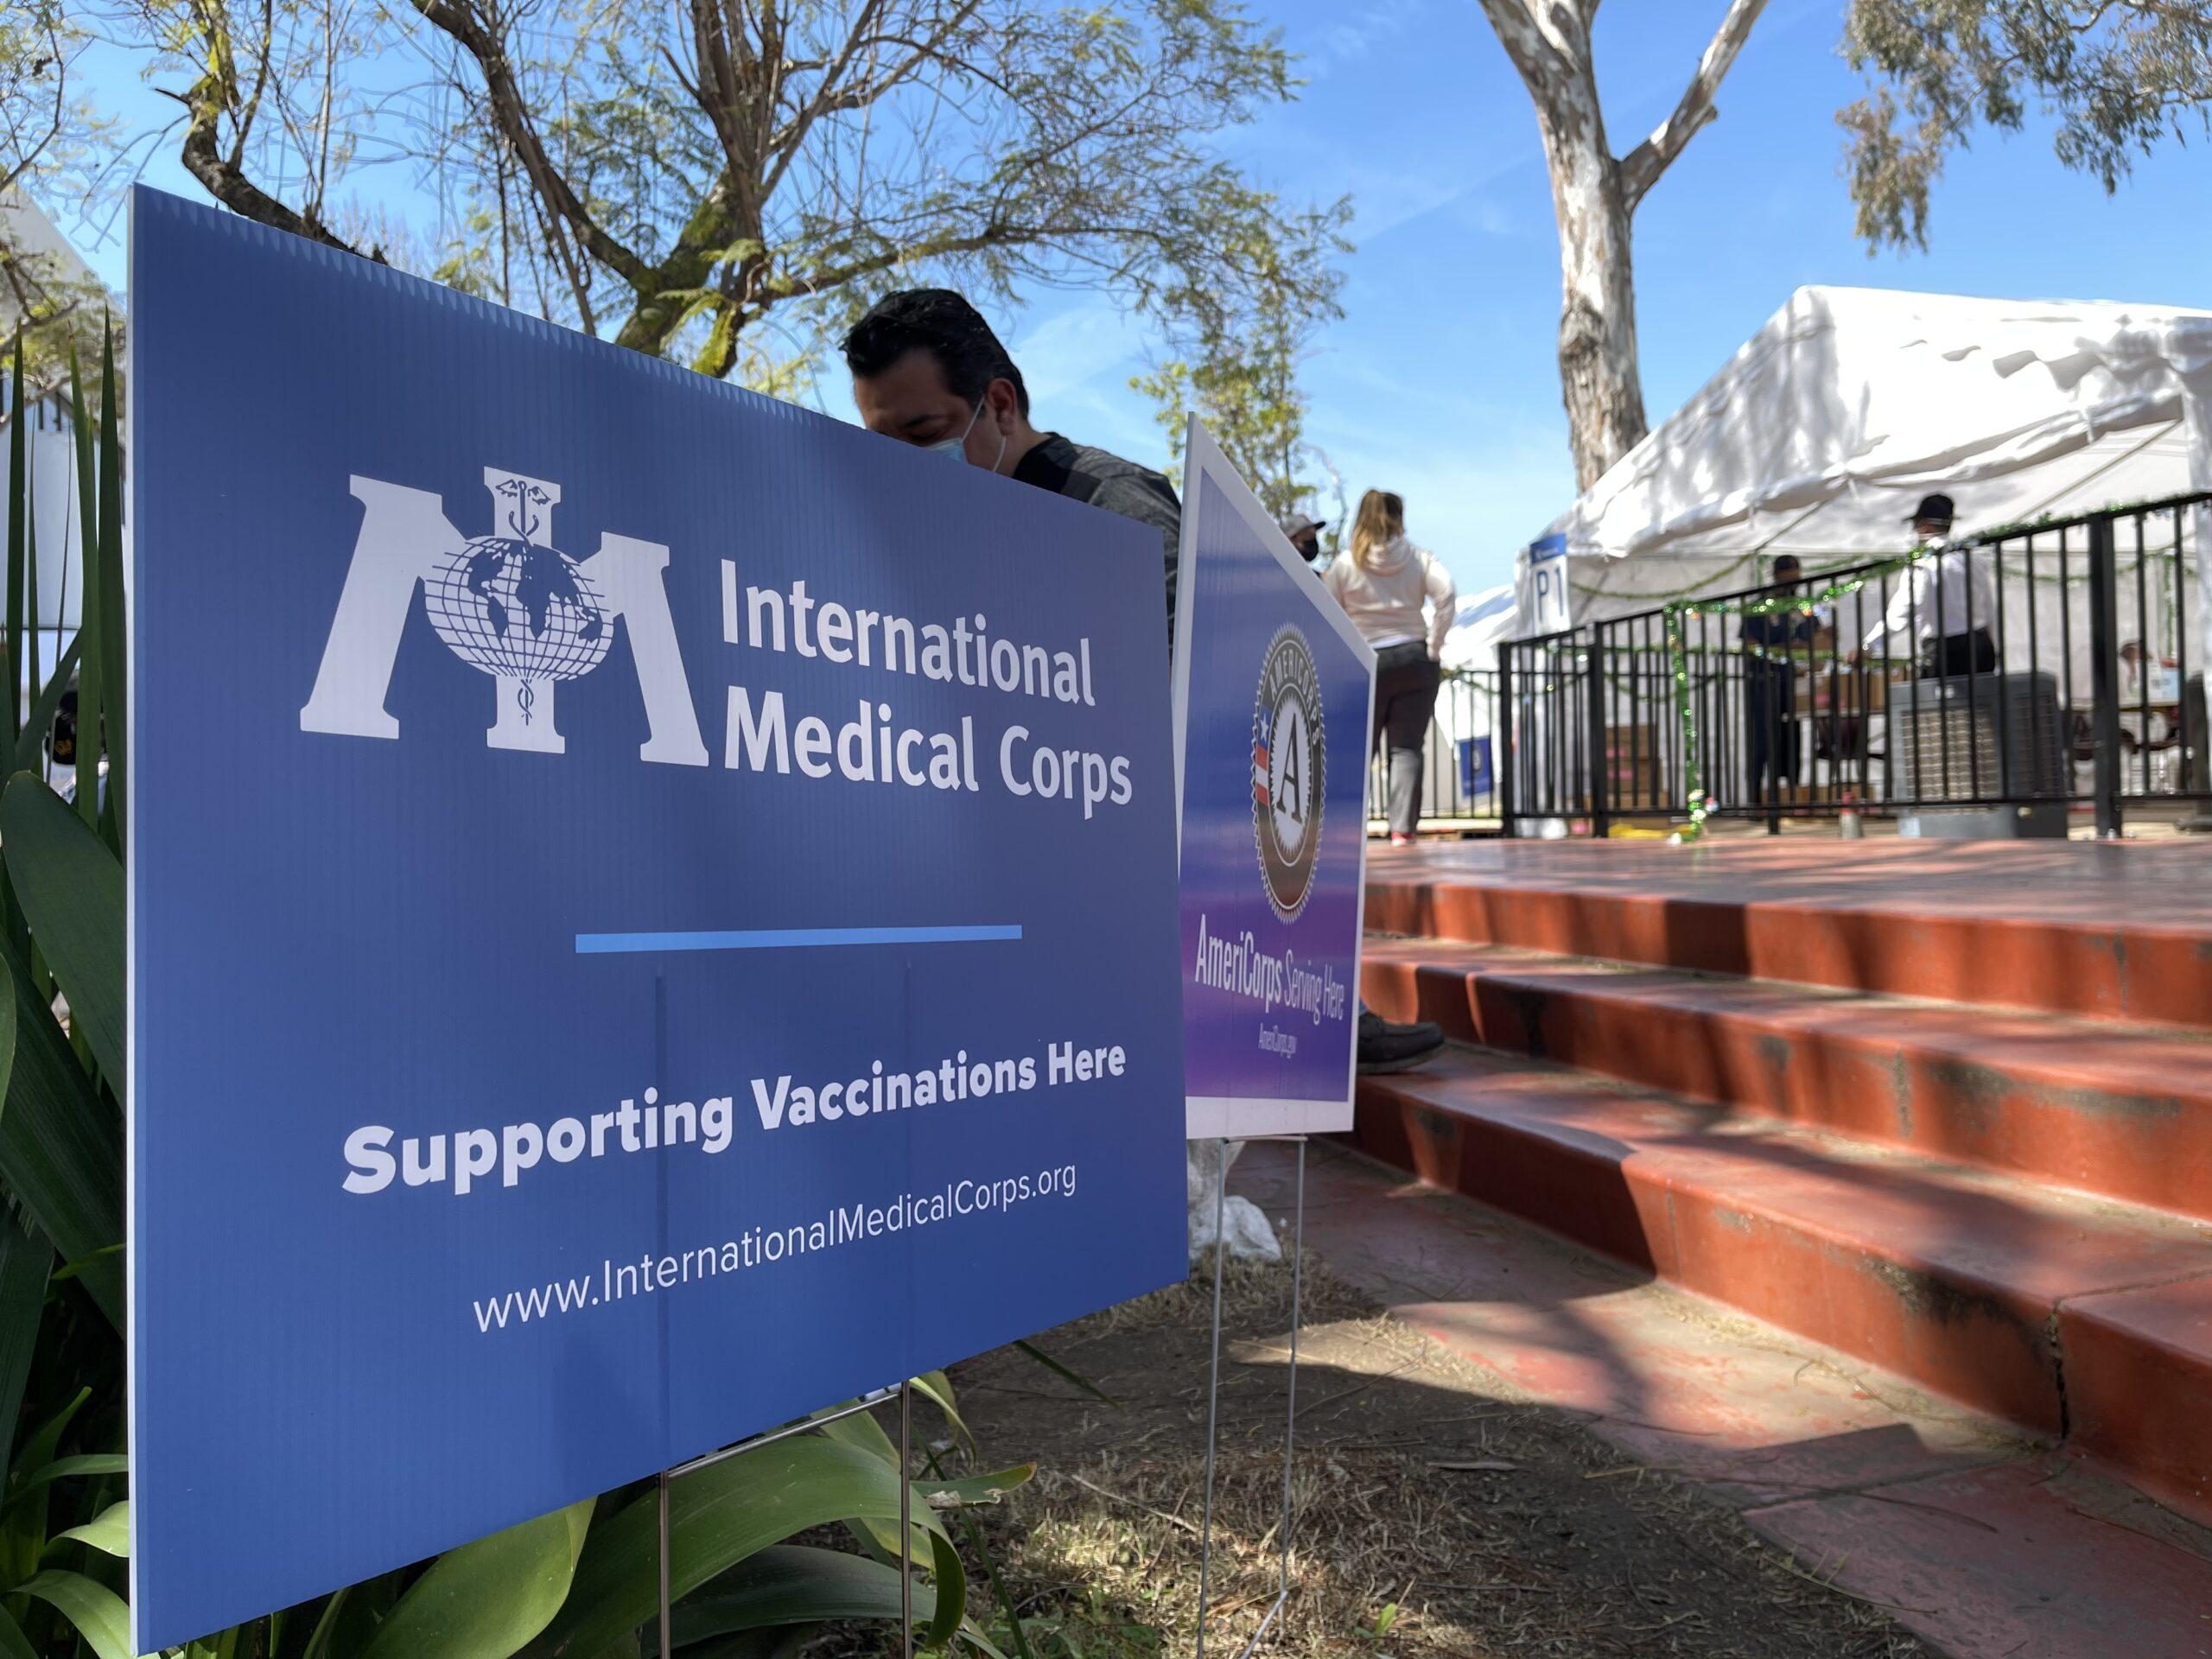 Kedren Community Health Center. International Medical Corps logo signage at the vaccination site.